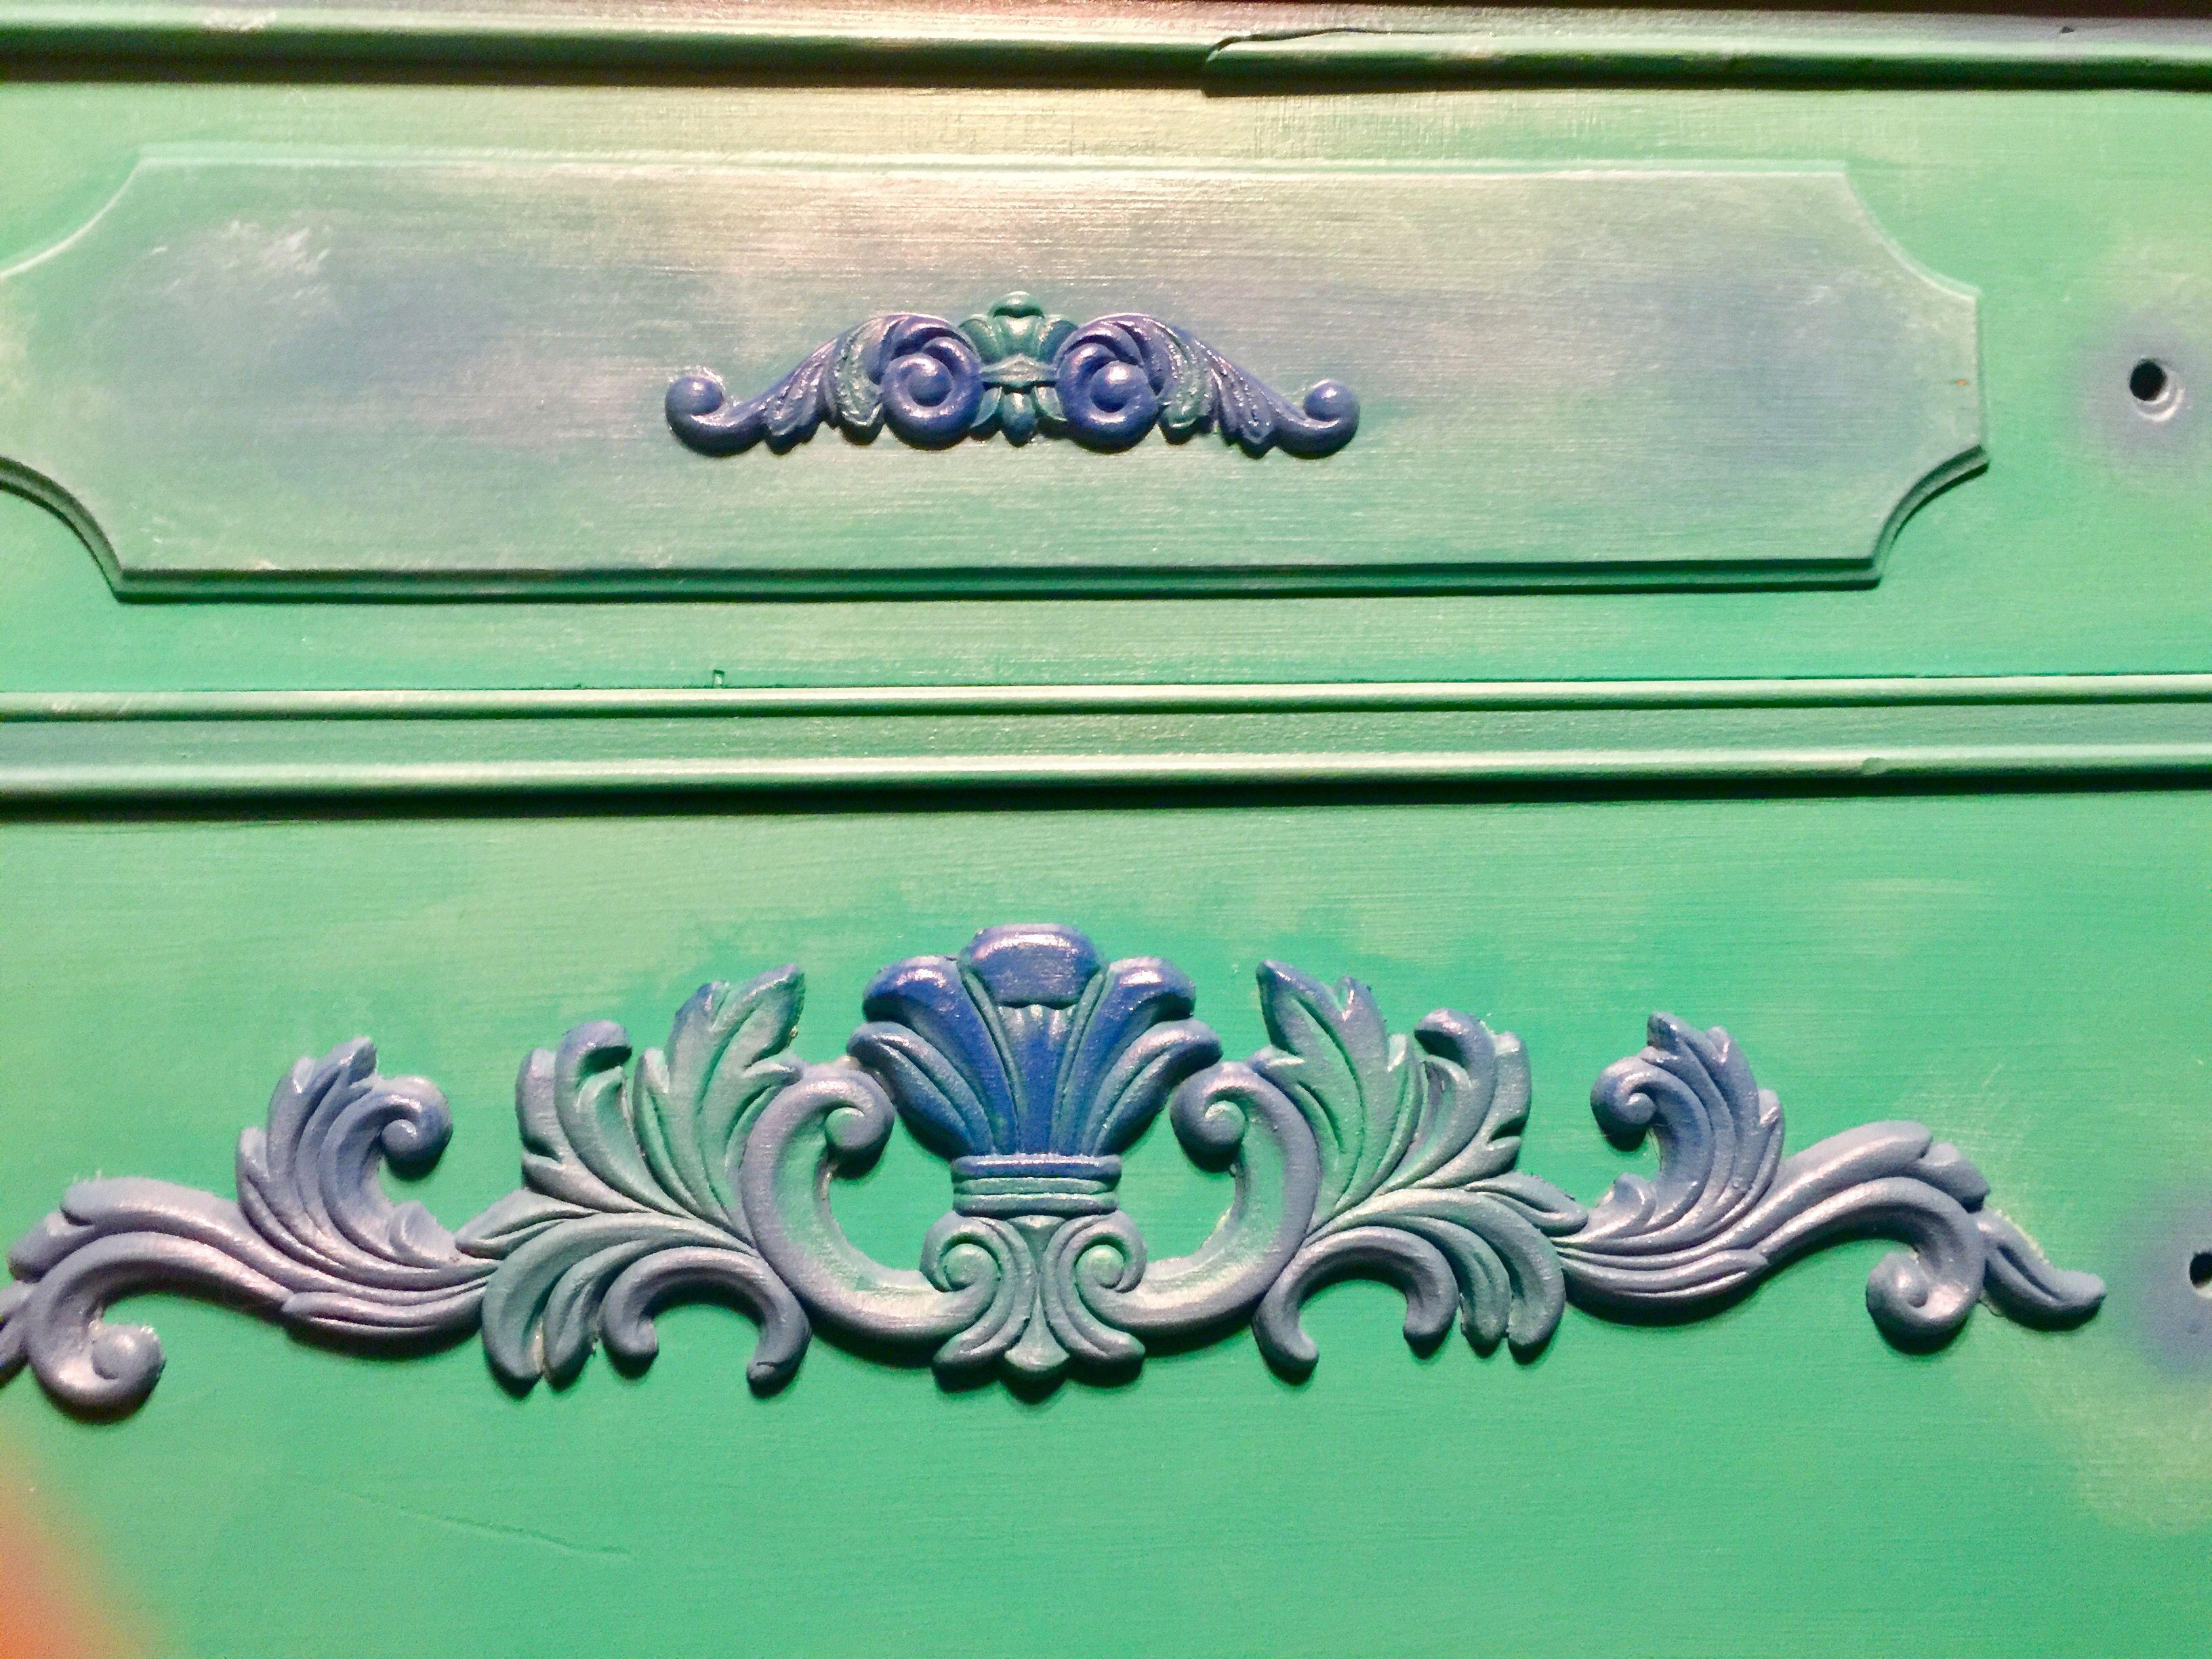 Appliqués Decorative boxes, Art projects, Art